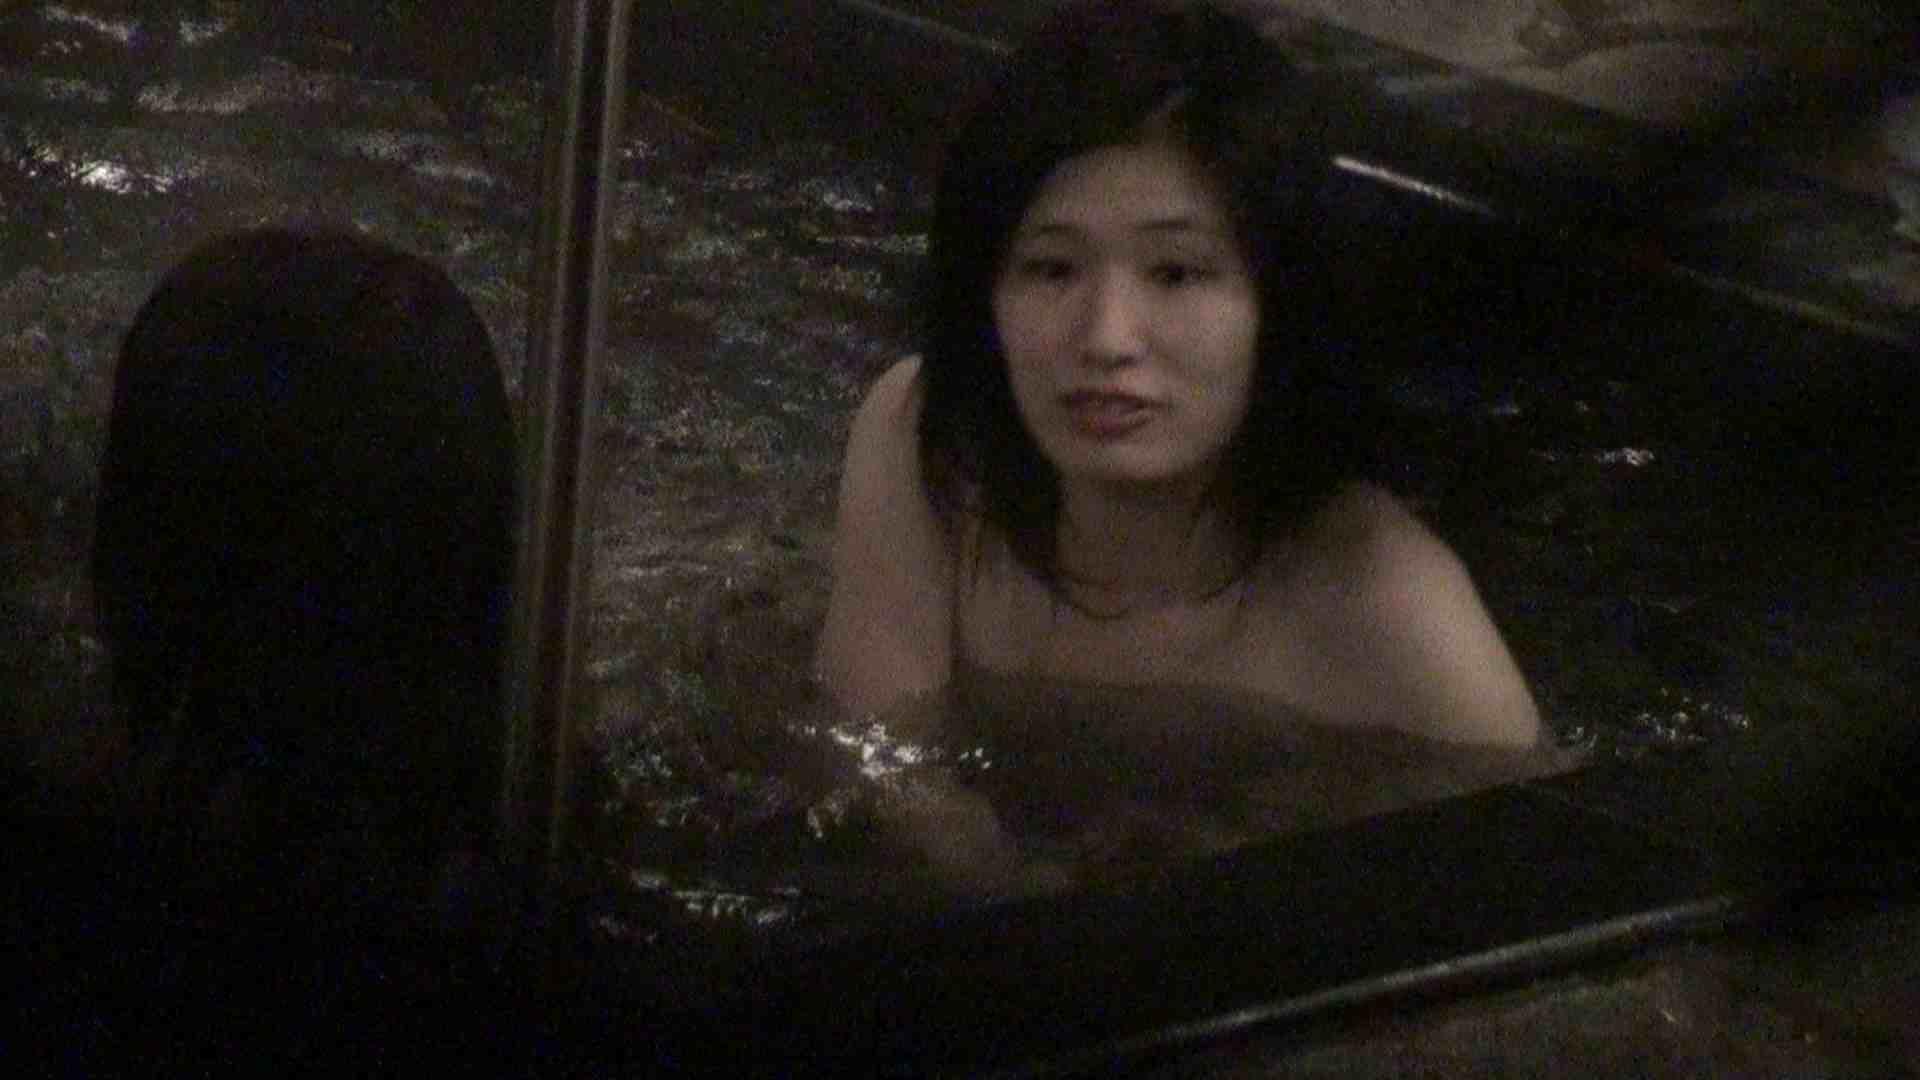 Aquaな露天風呂Vol.348 露天   HなOL  104pic 34